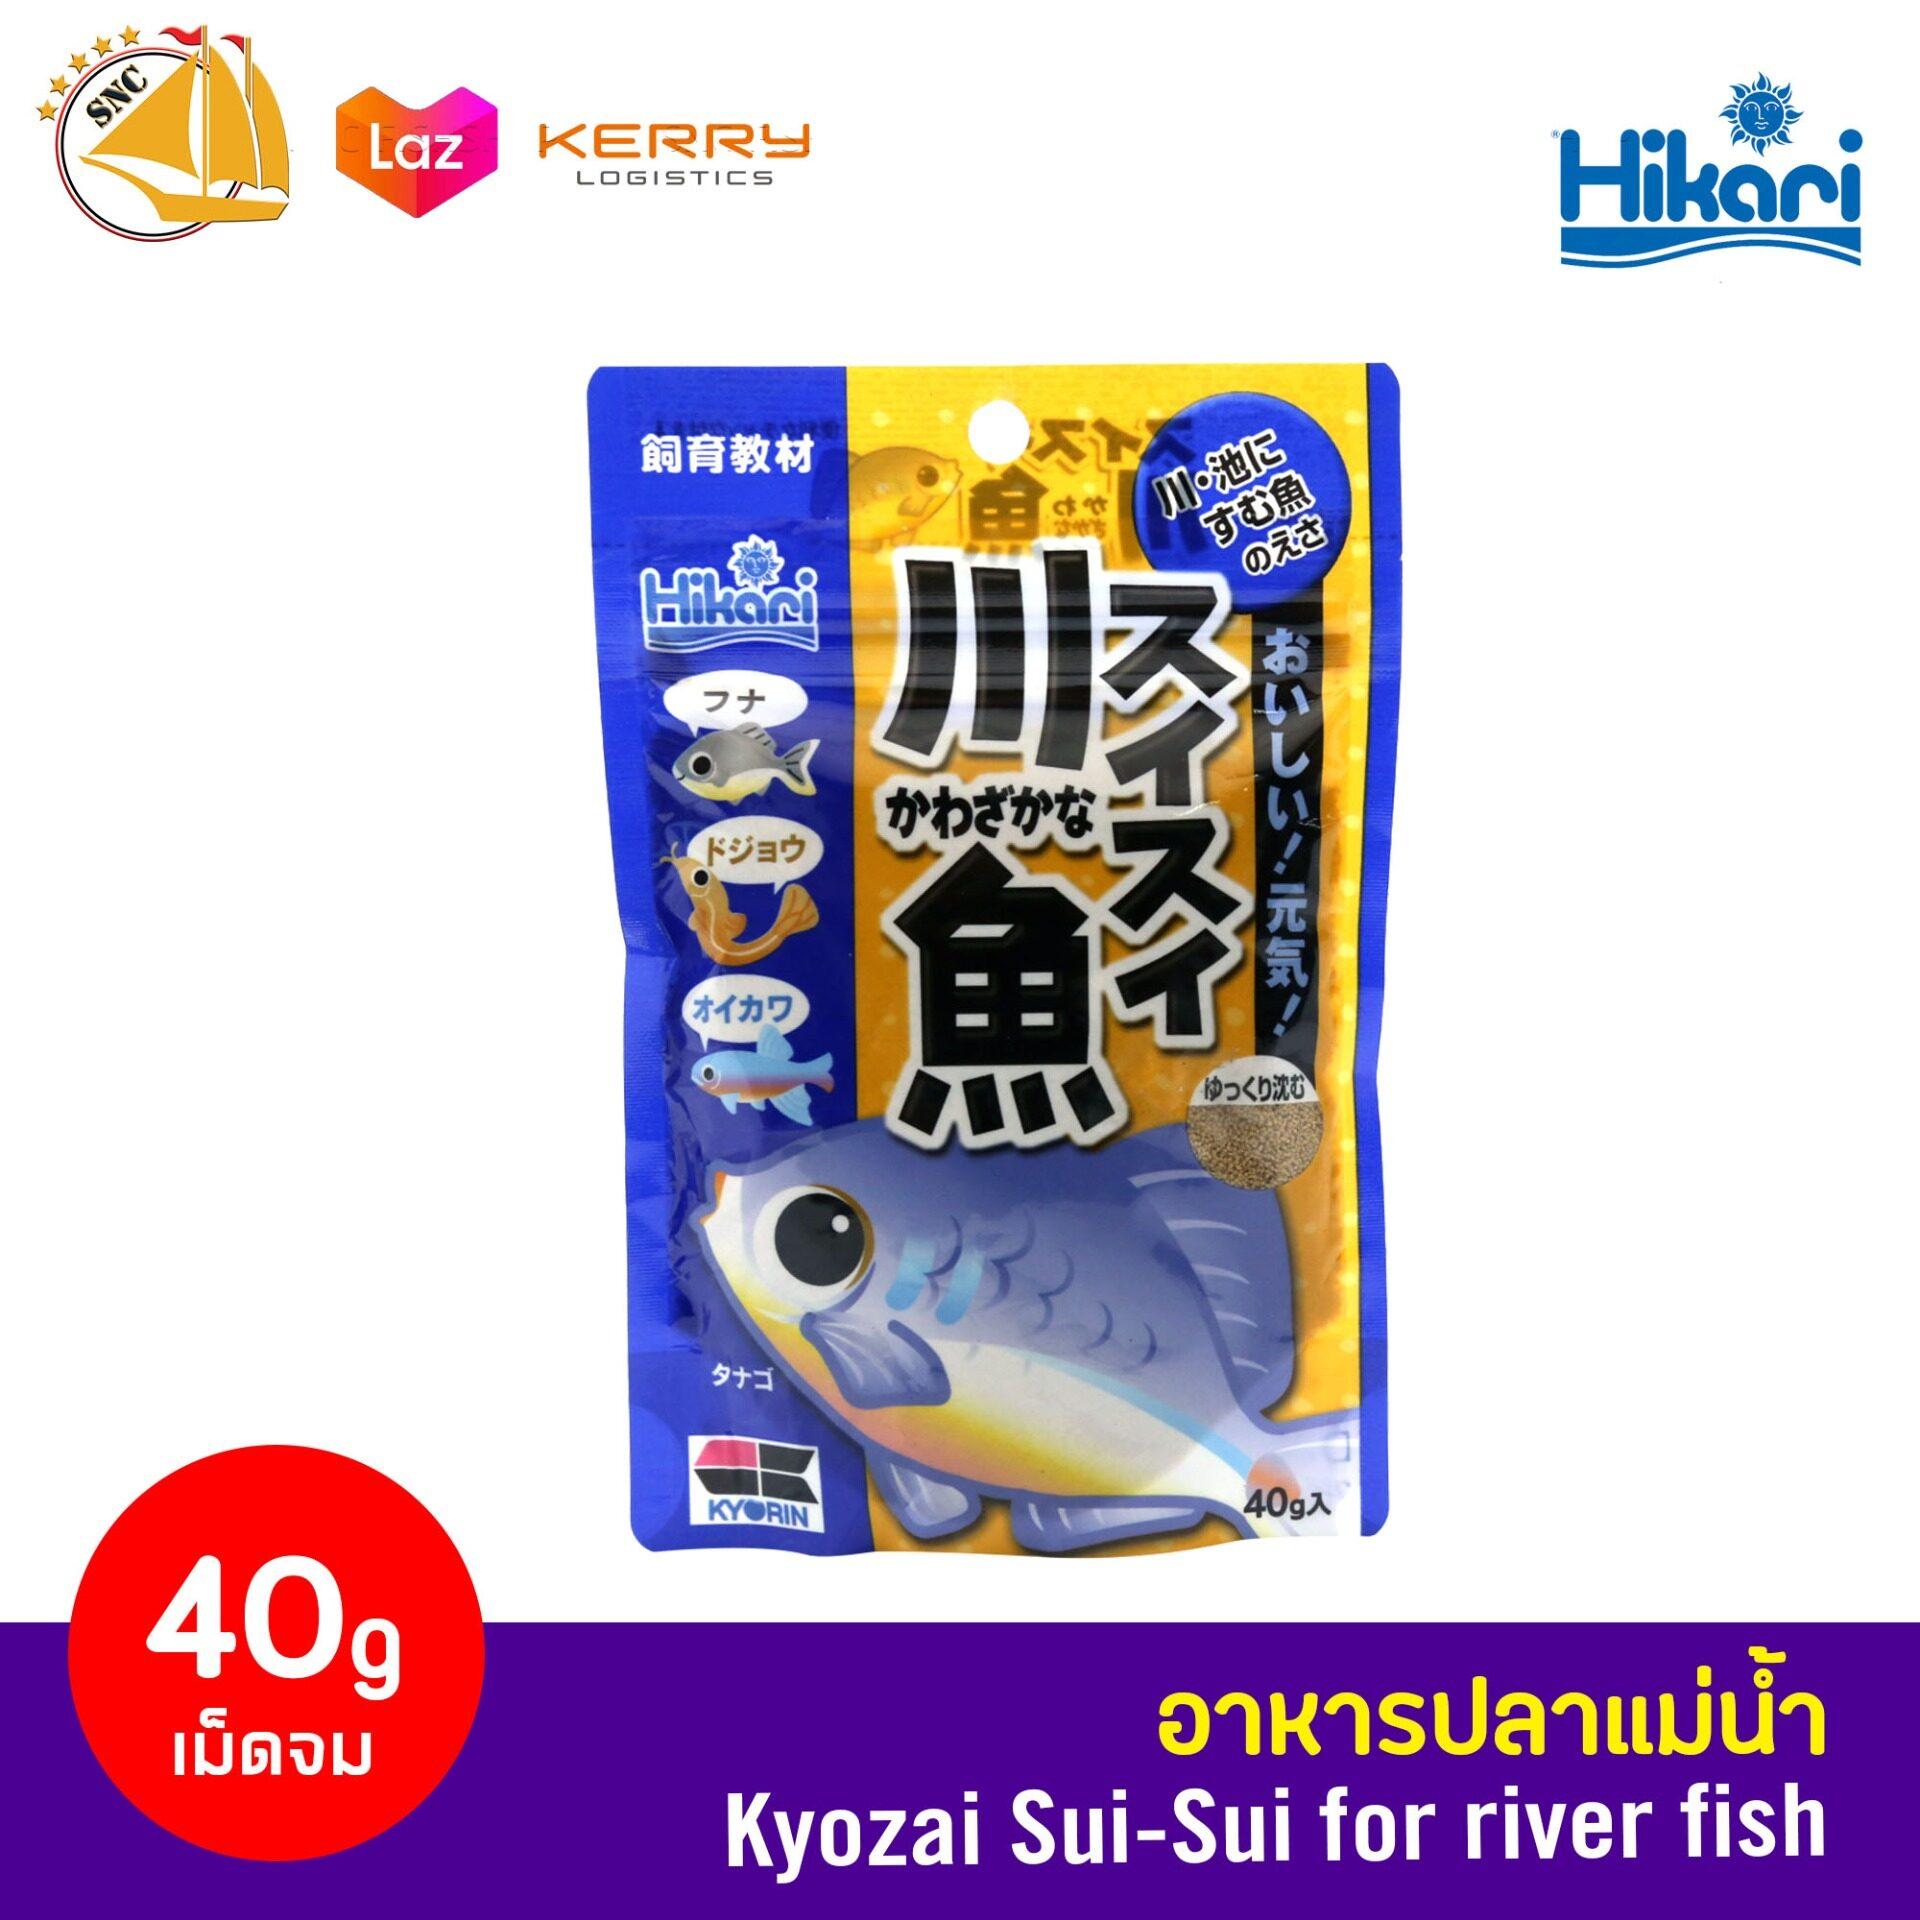 Hikari Kyozai Sui-Sui อาหารปลาแม่น้ำ 40g